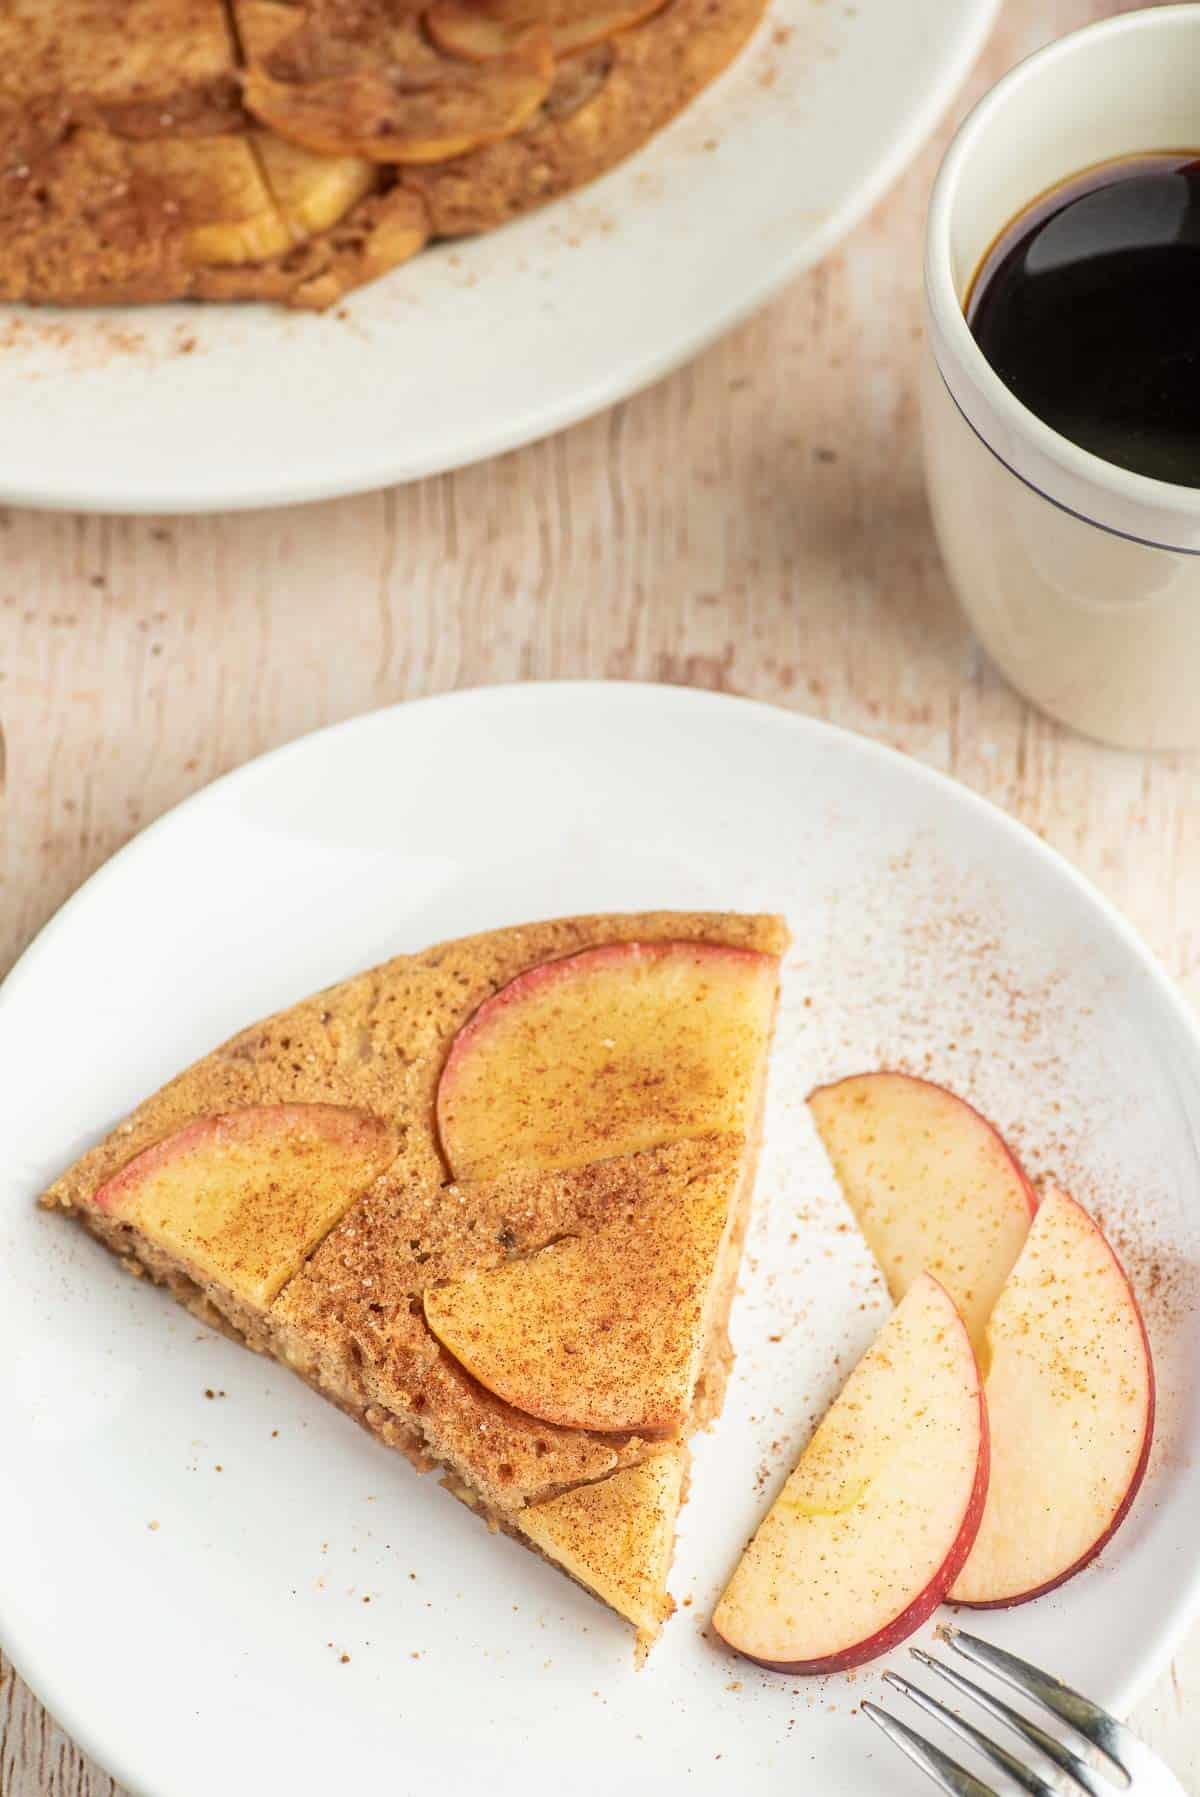 Slice of apple pancake on a plate.